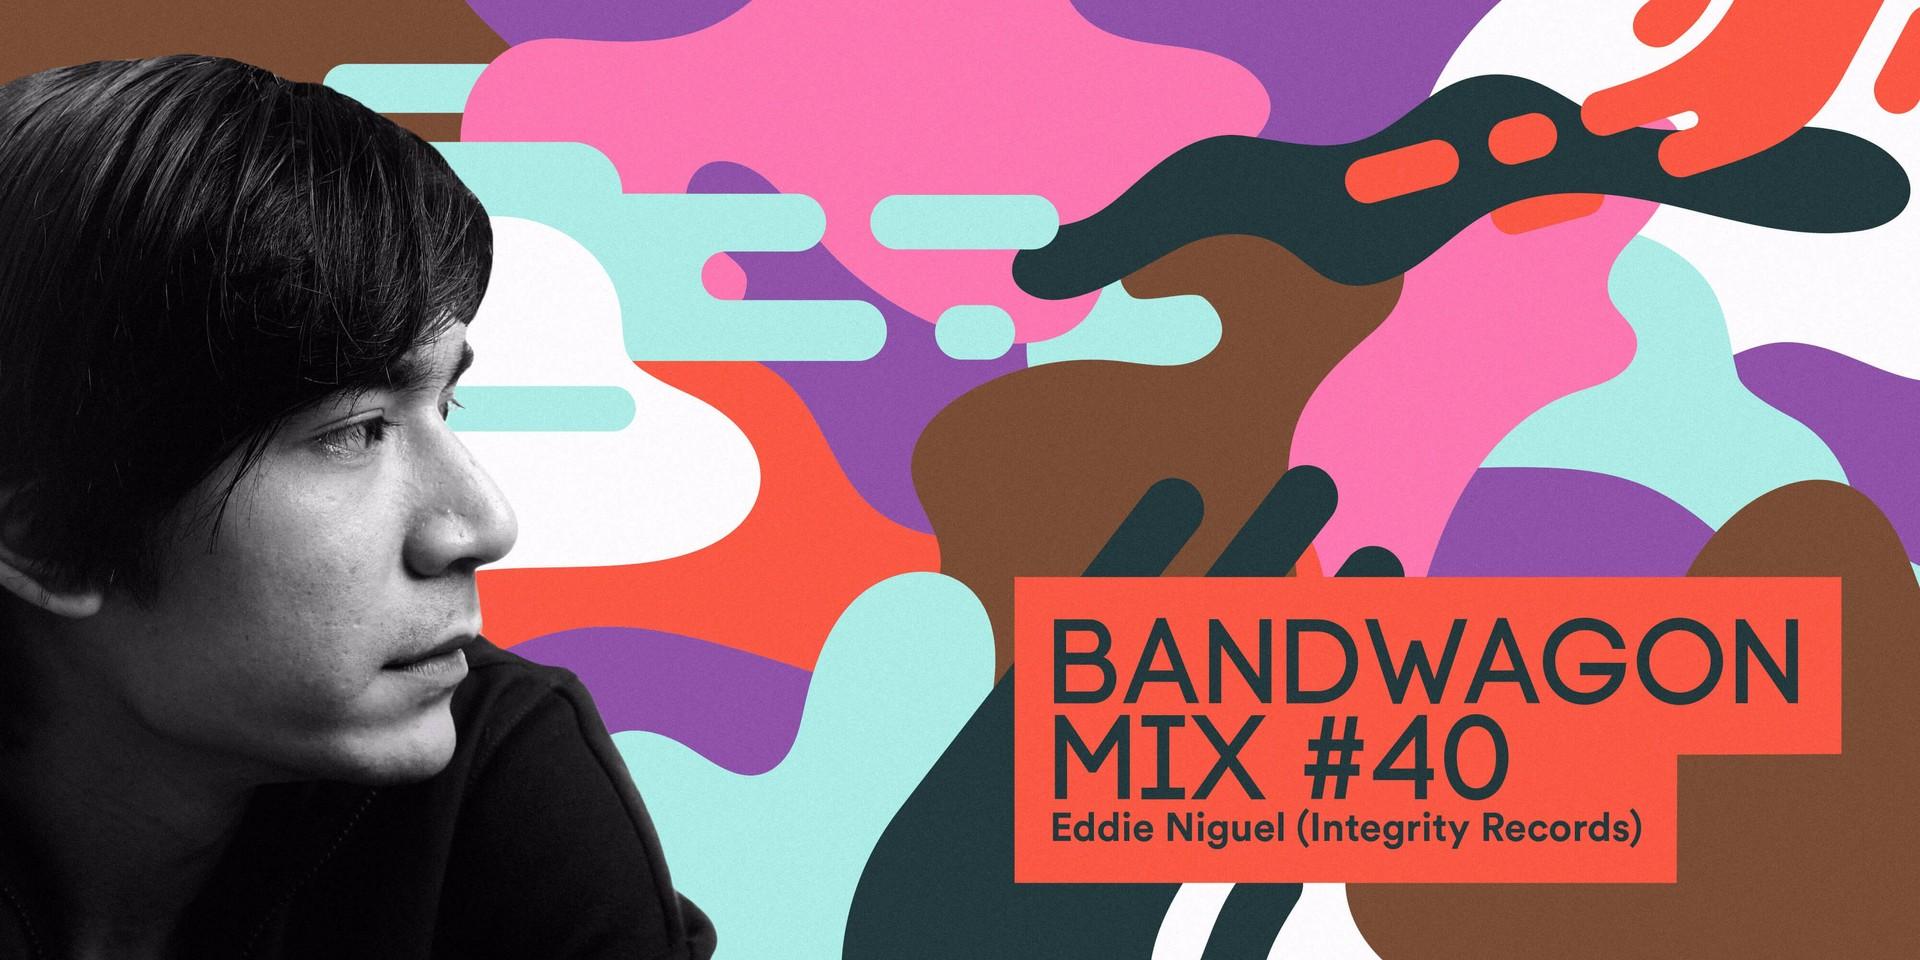 Bandwagon Mix #40: Eddie Niguel (Integrity Records)